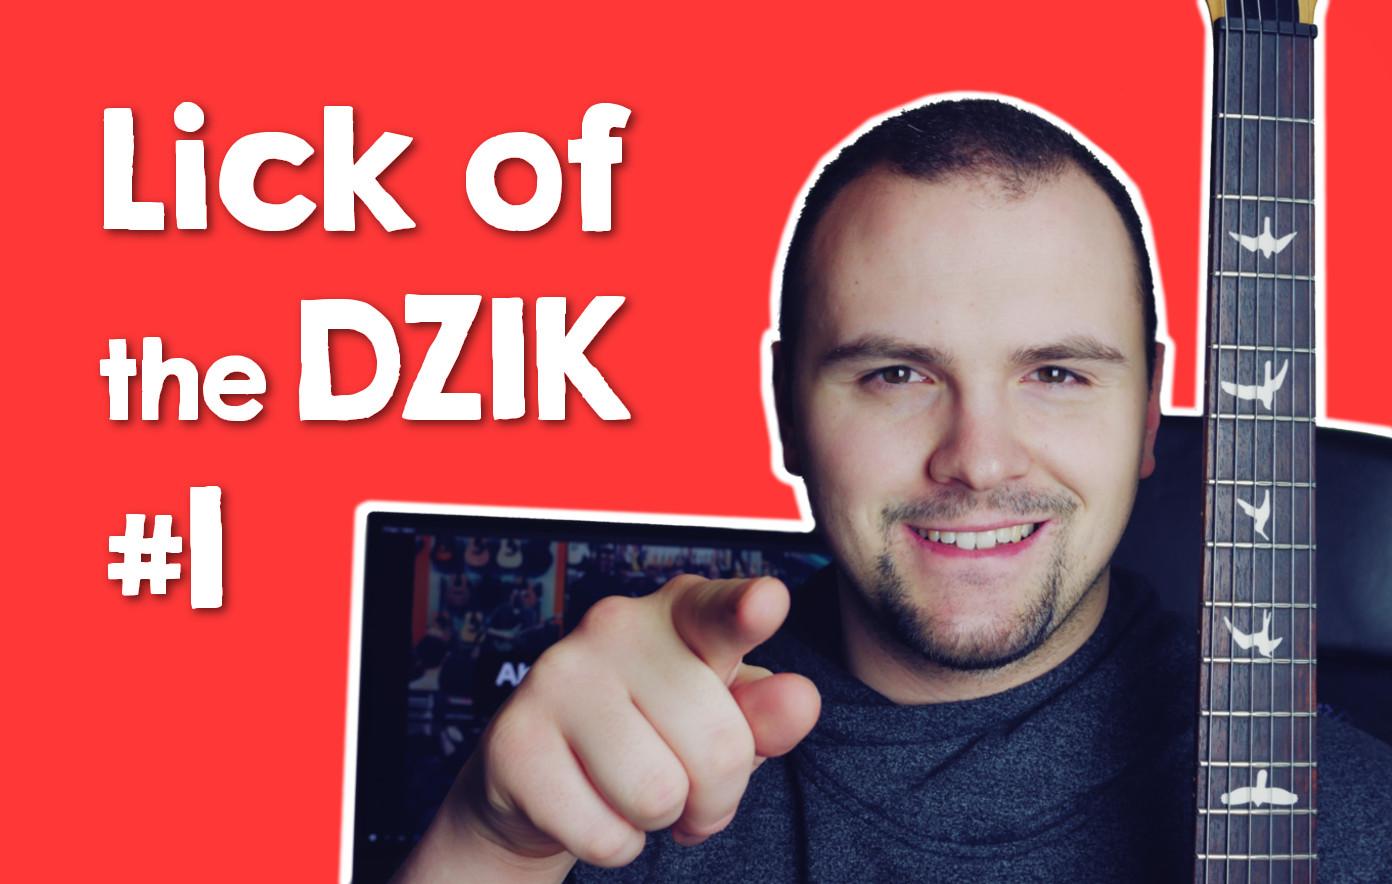 [LEKCJA] Lick of the DZIK #1 – Blues Am – Start